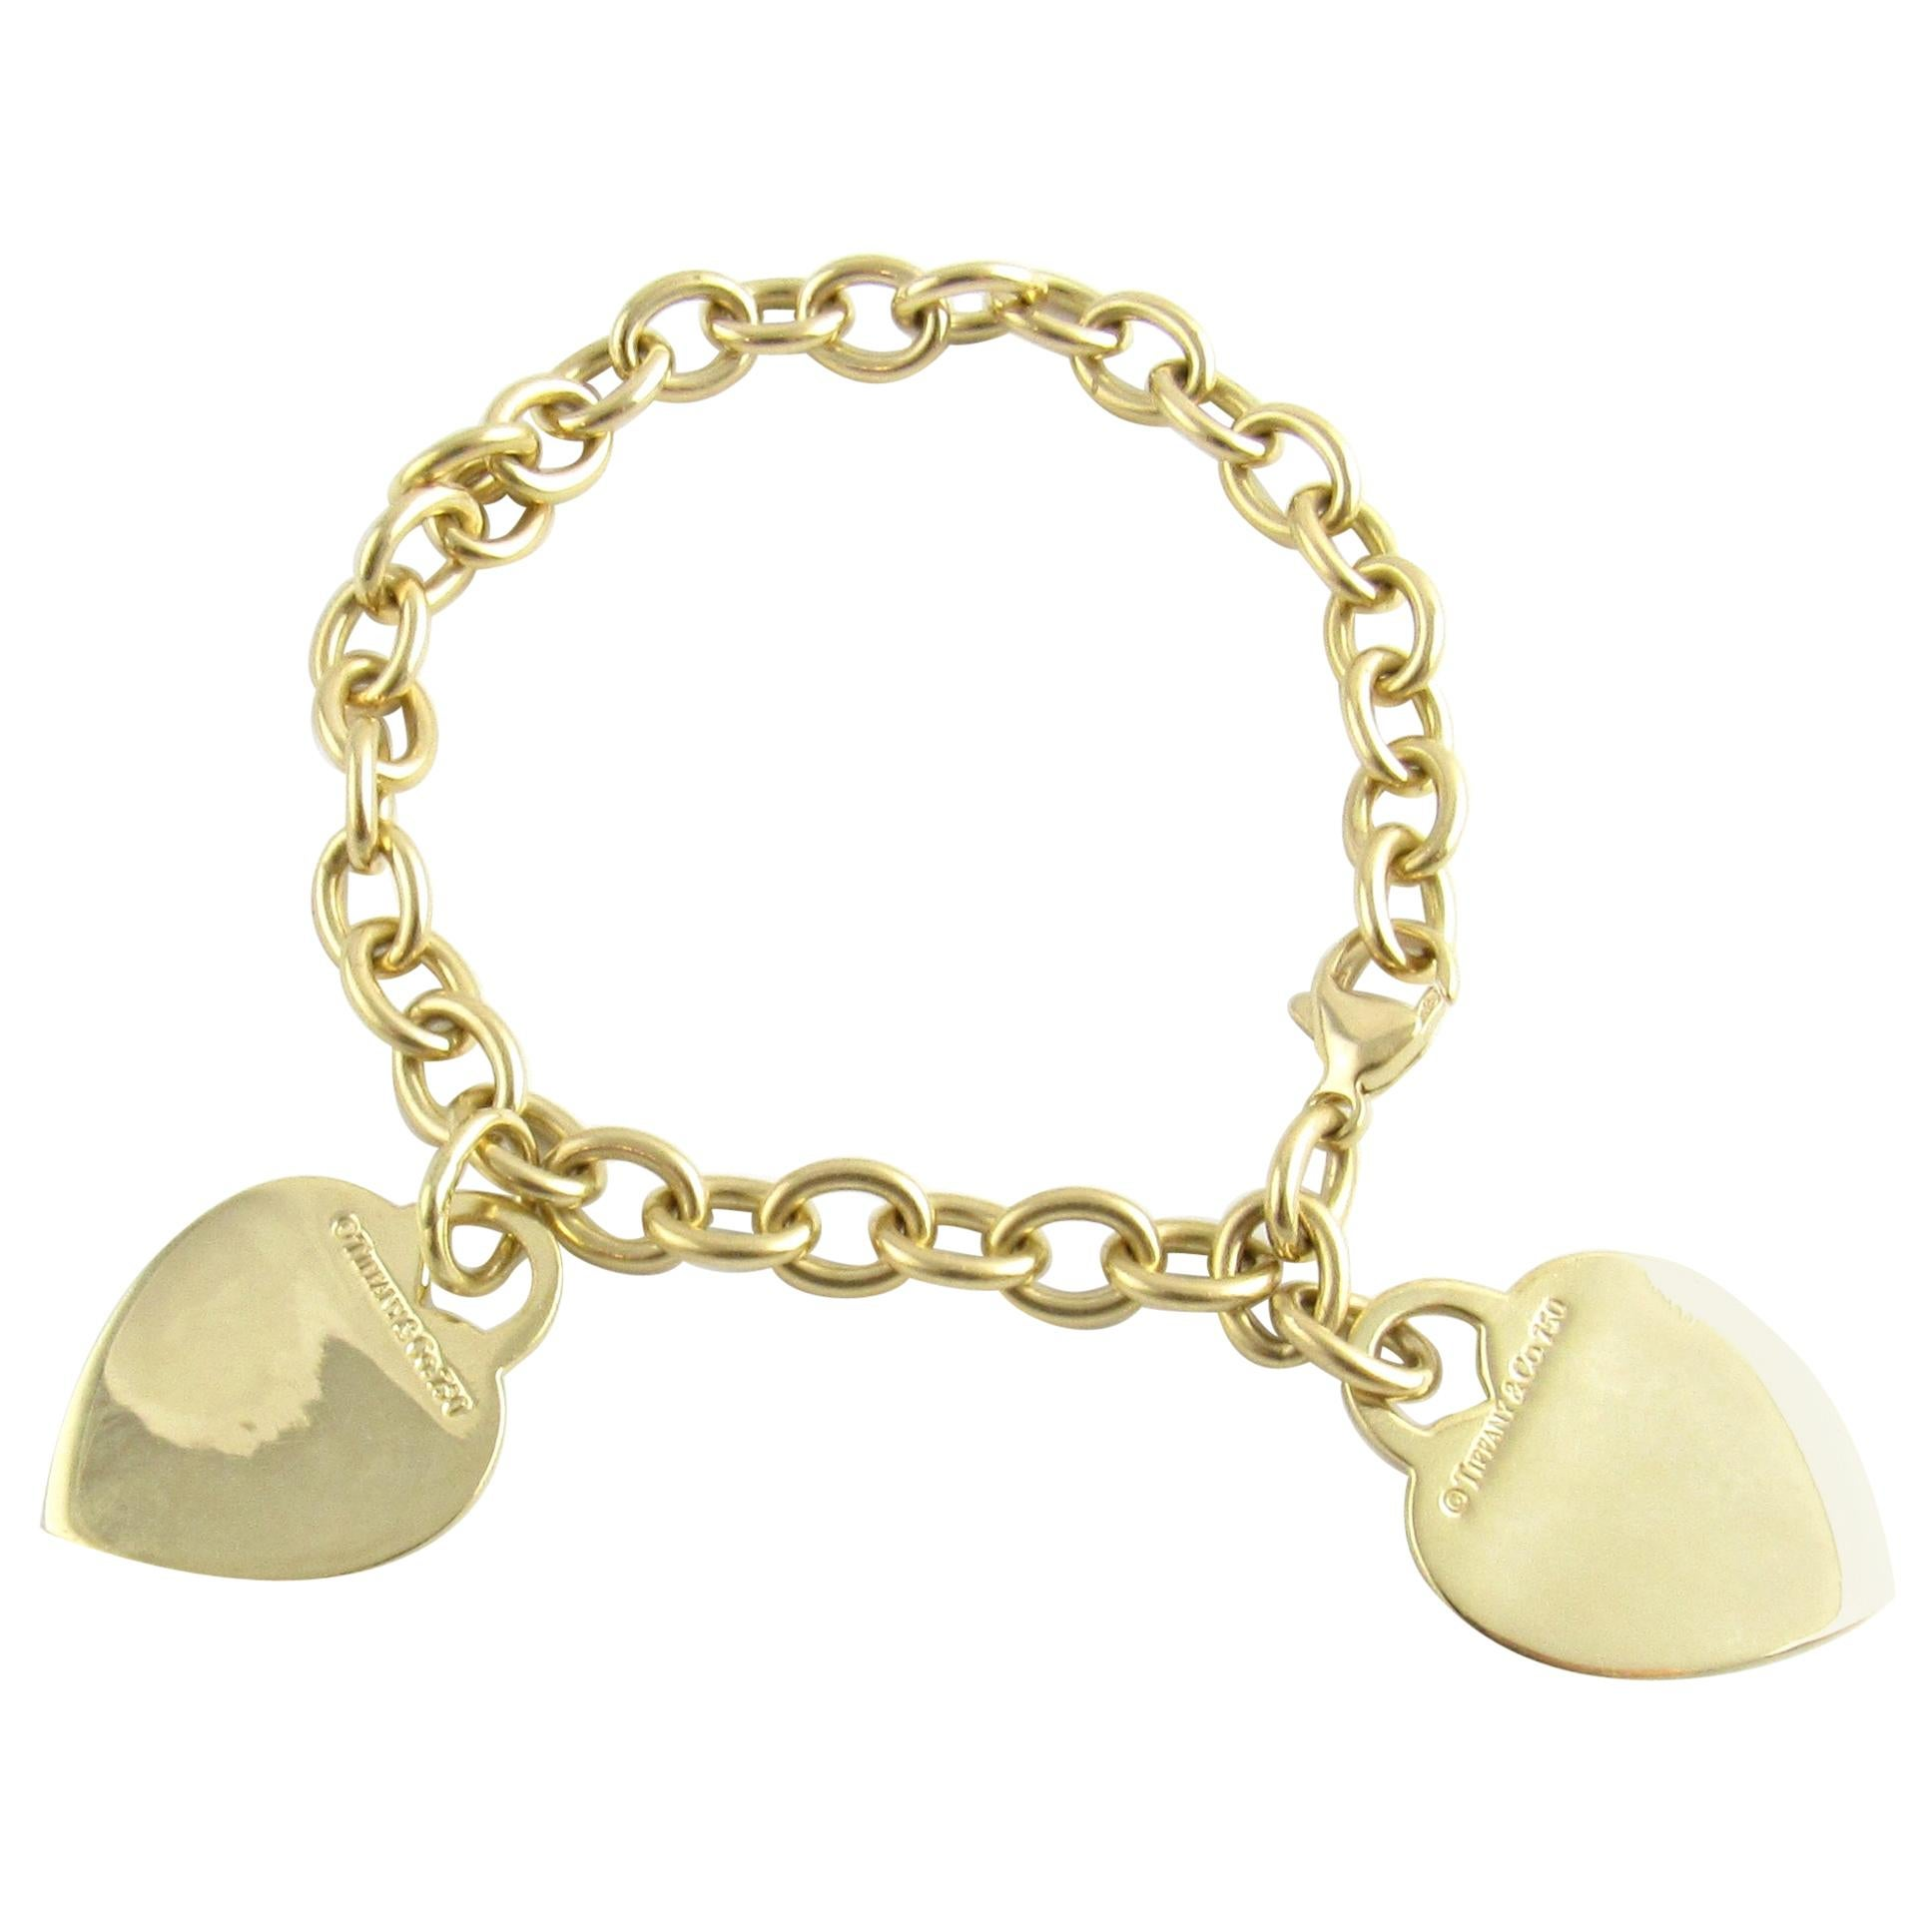 0cc12cde8769c Tiffany & Co. Bracelets - 278 For Sale at 1stdibs